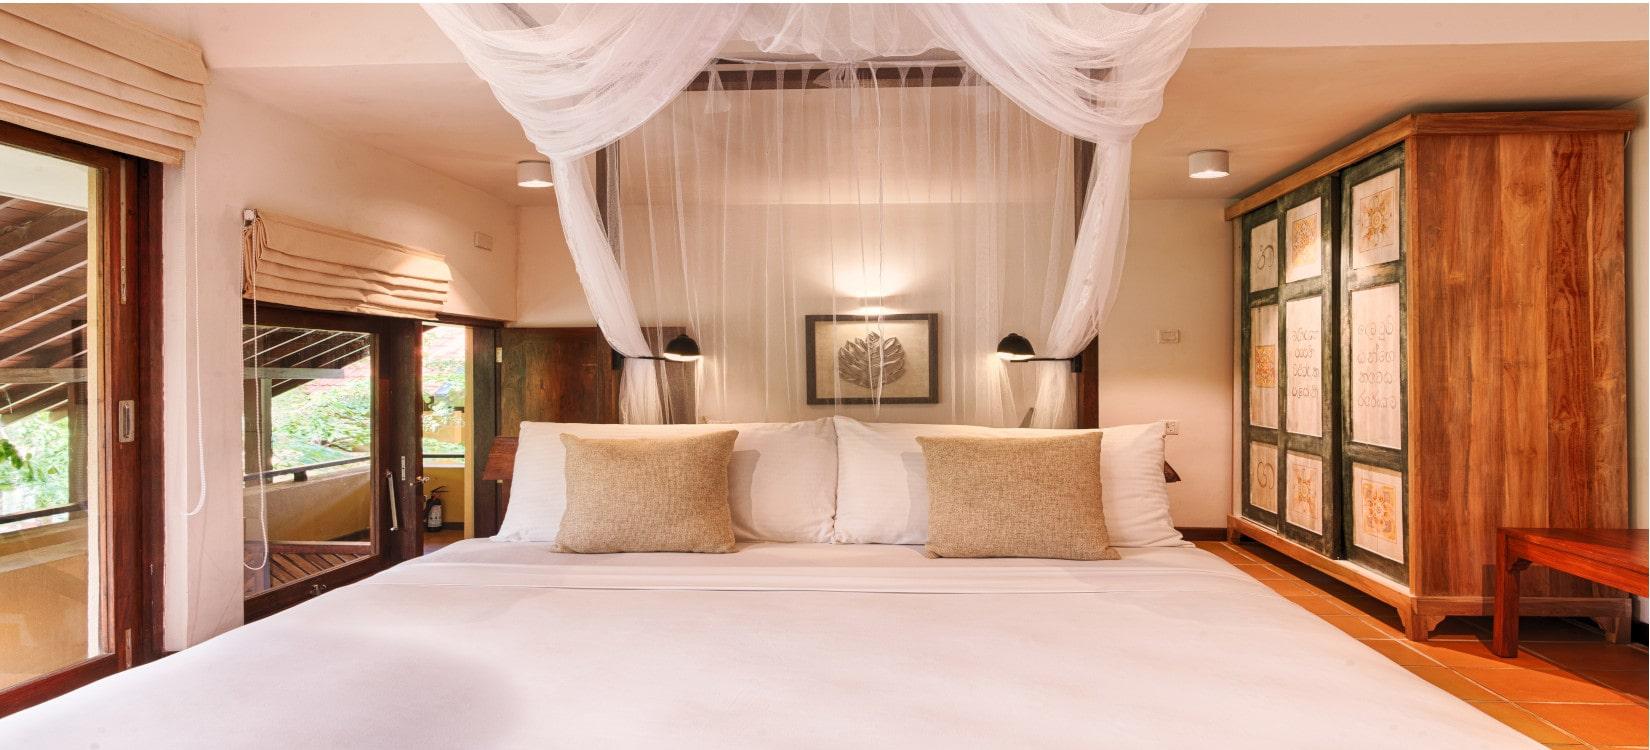 standard room Ayurveda Palions-min